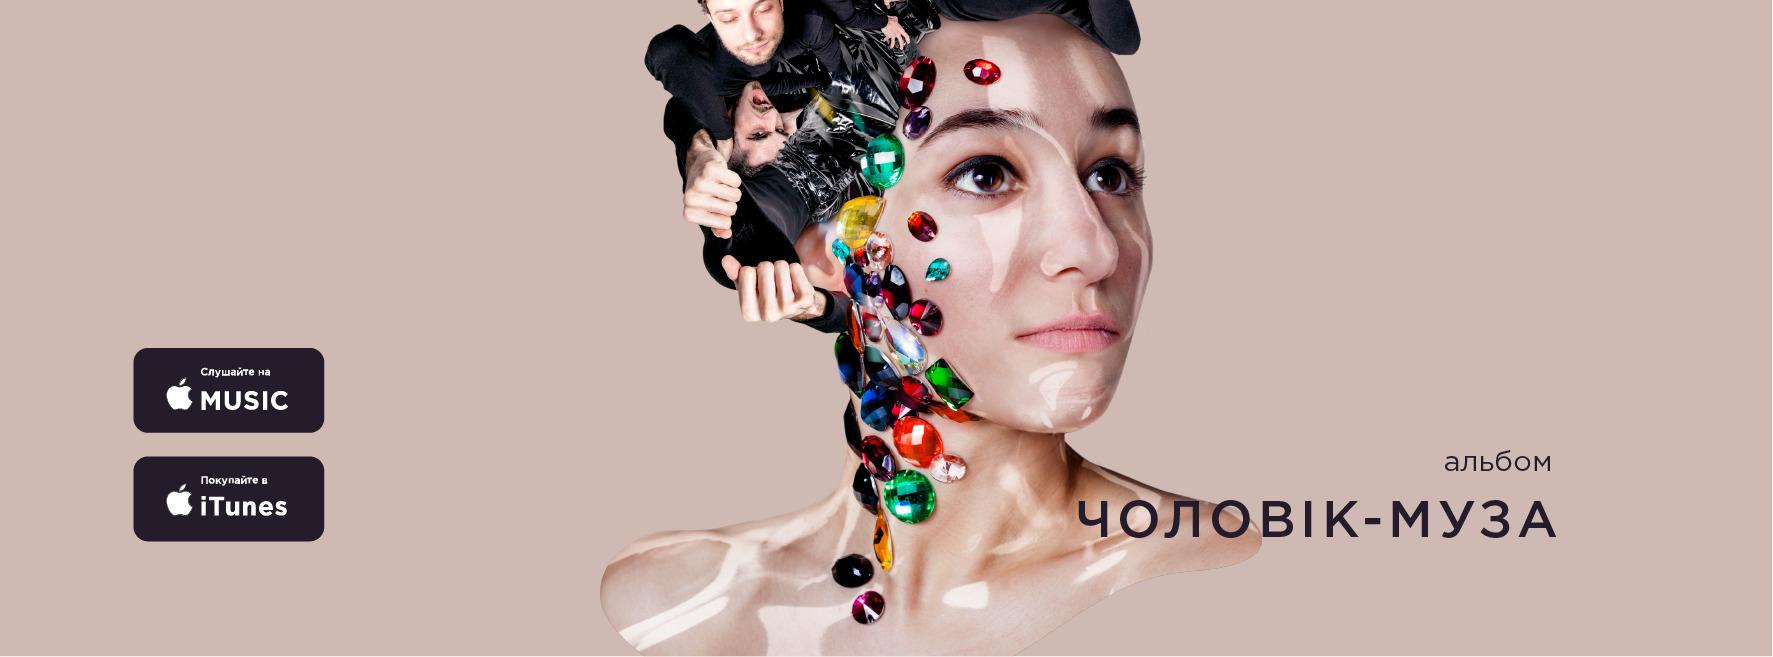 Группа «её» (@yeyomusic) Cover Image